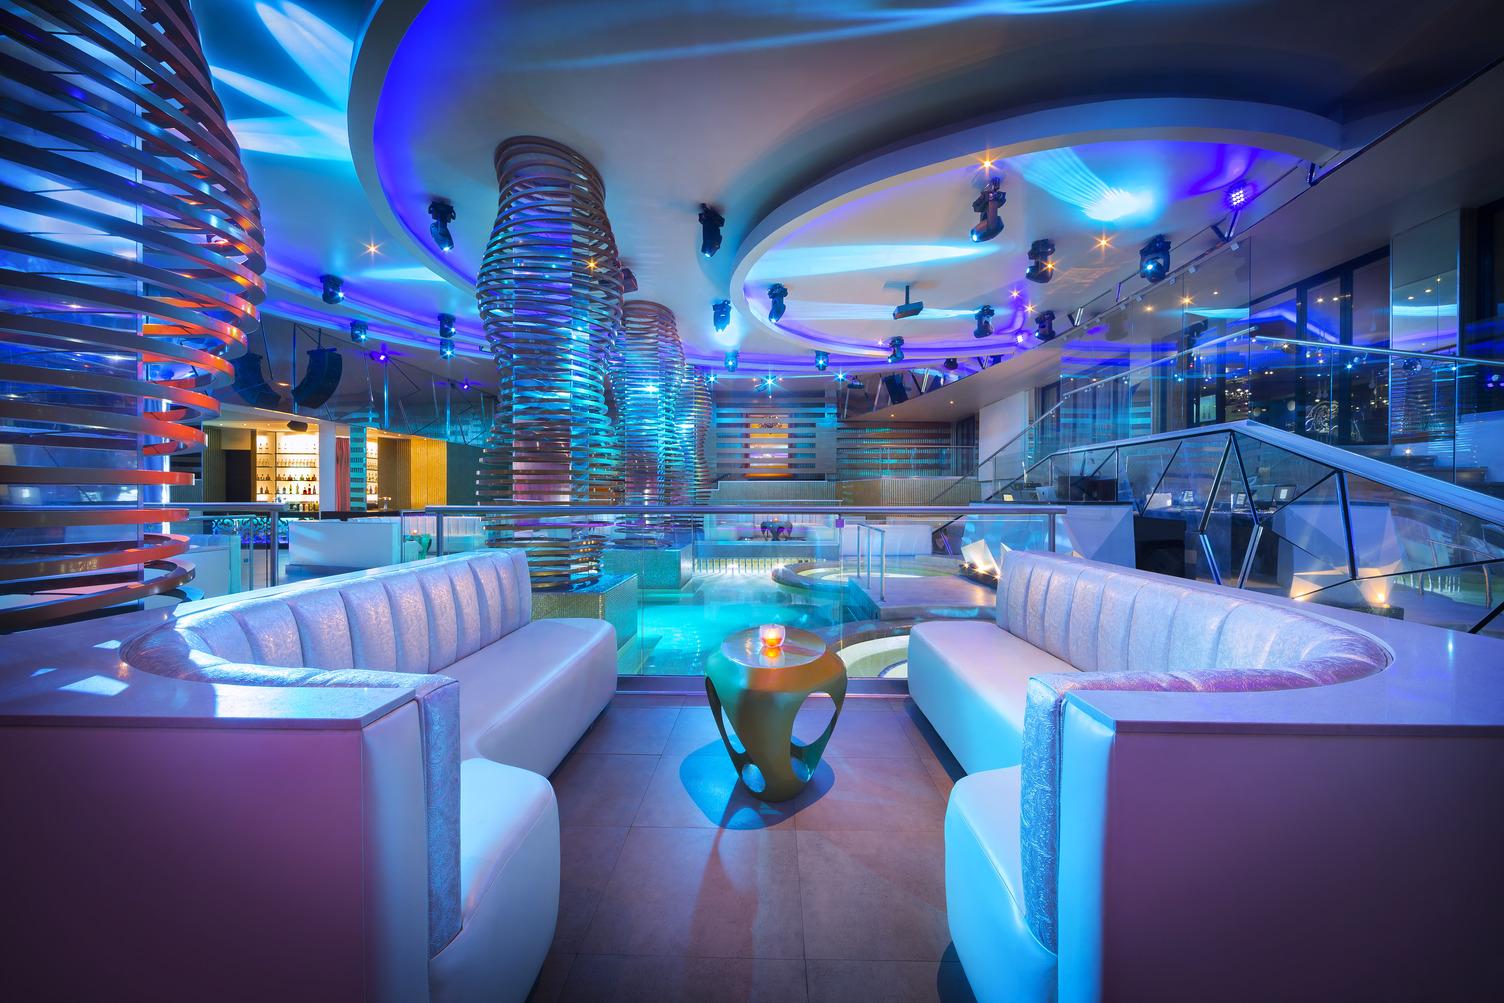 Travel Agency All-Inclusive Resort Heaven at Hard Rock Hotel Riviera Maya 50